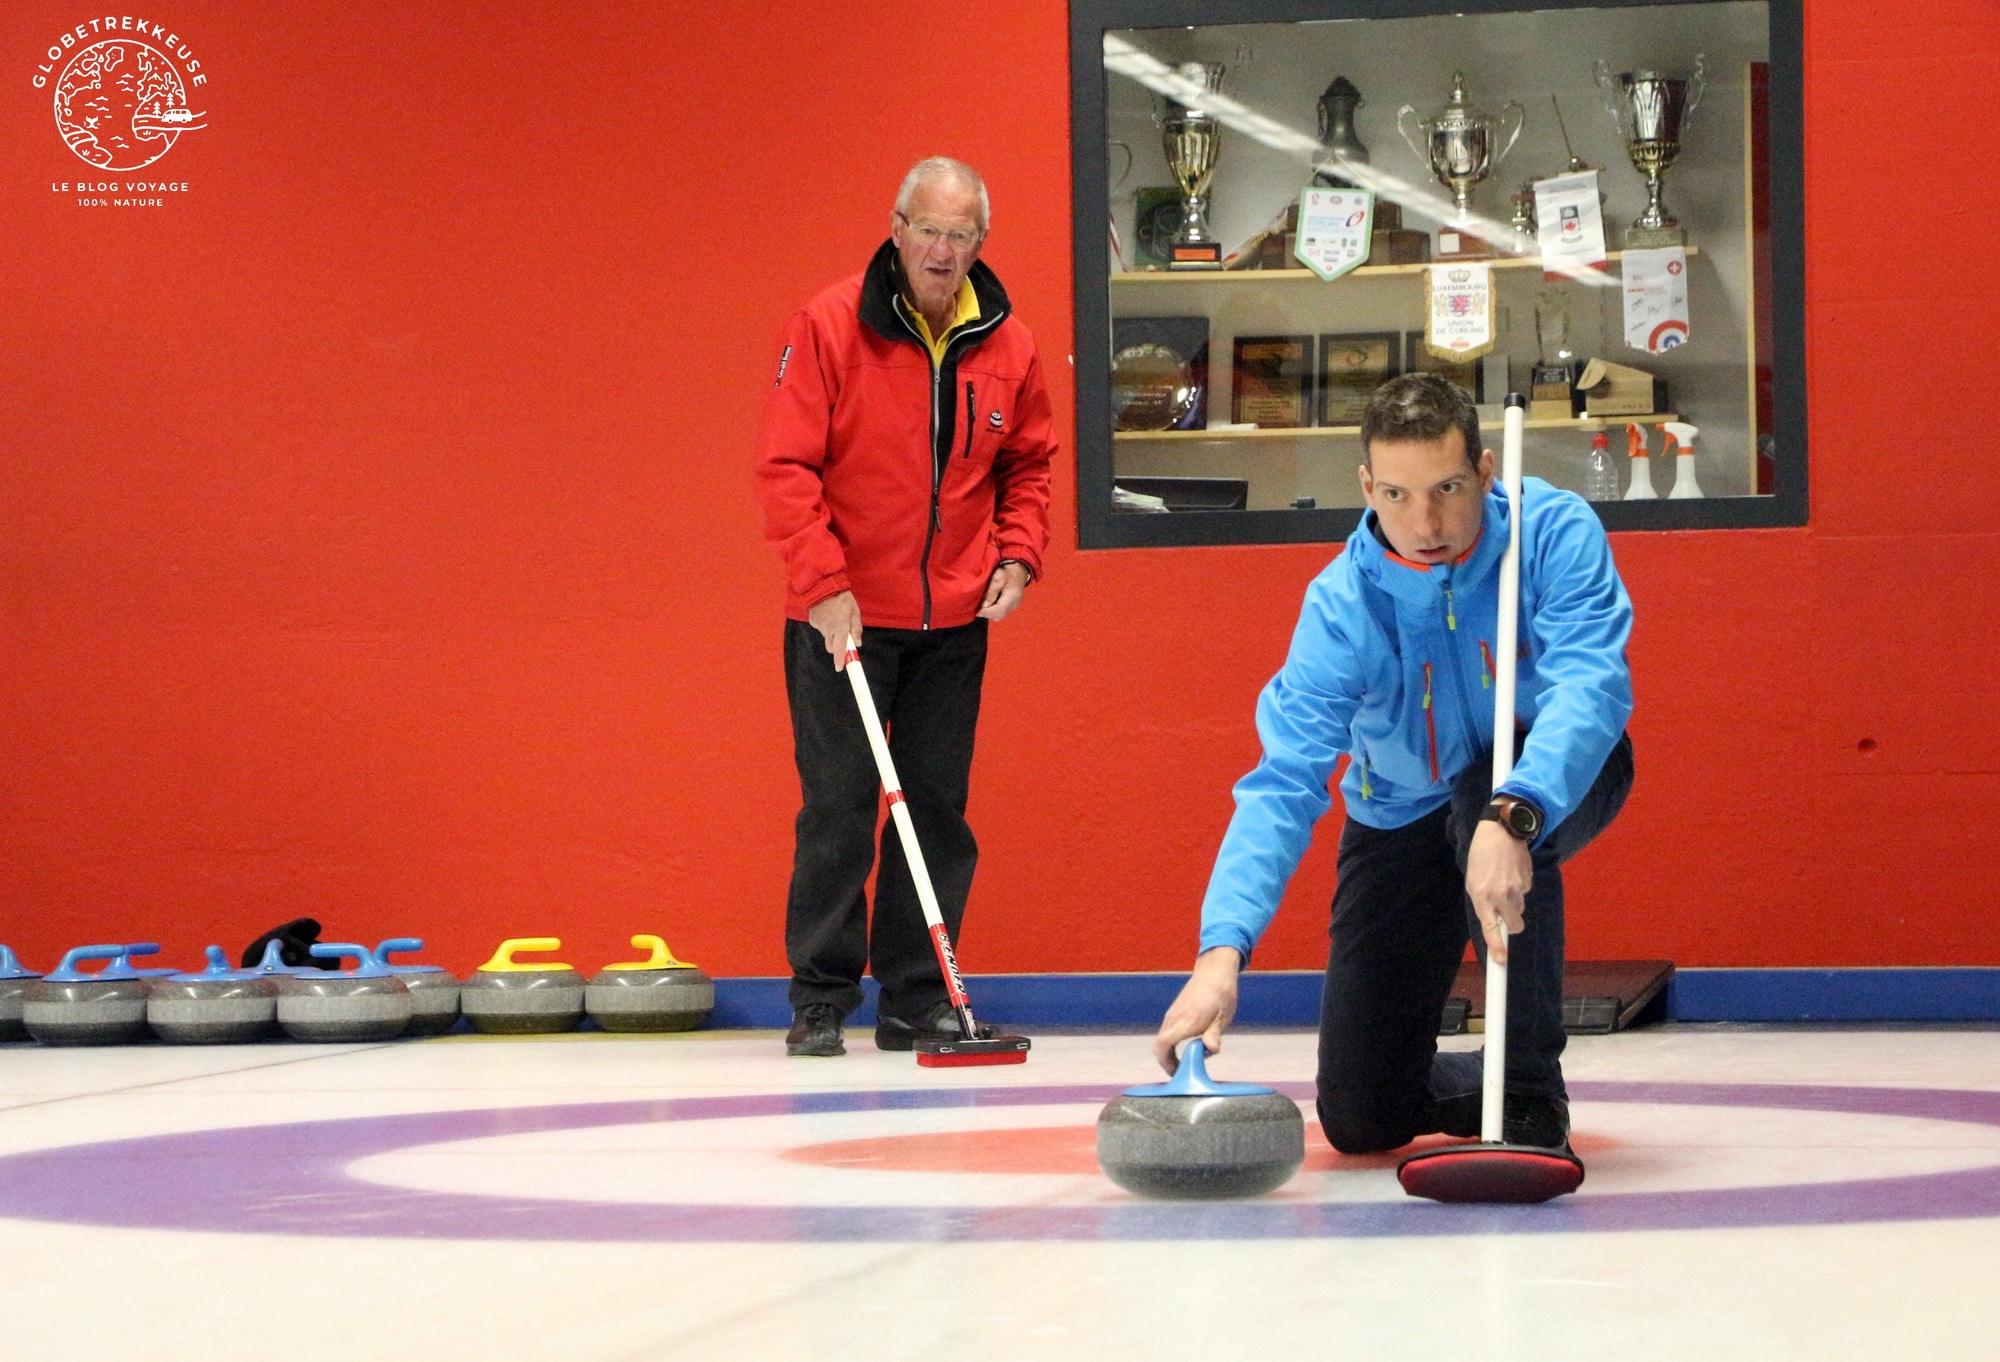 hiver en suisse champery curling